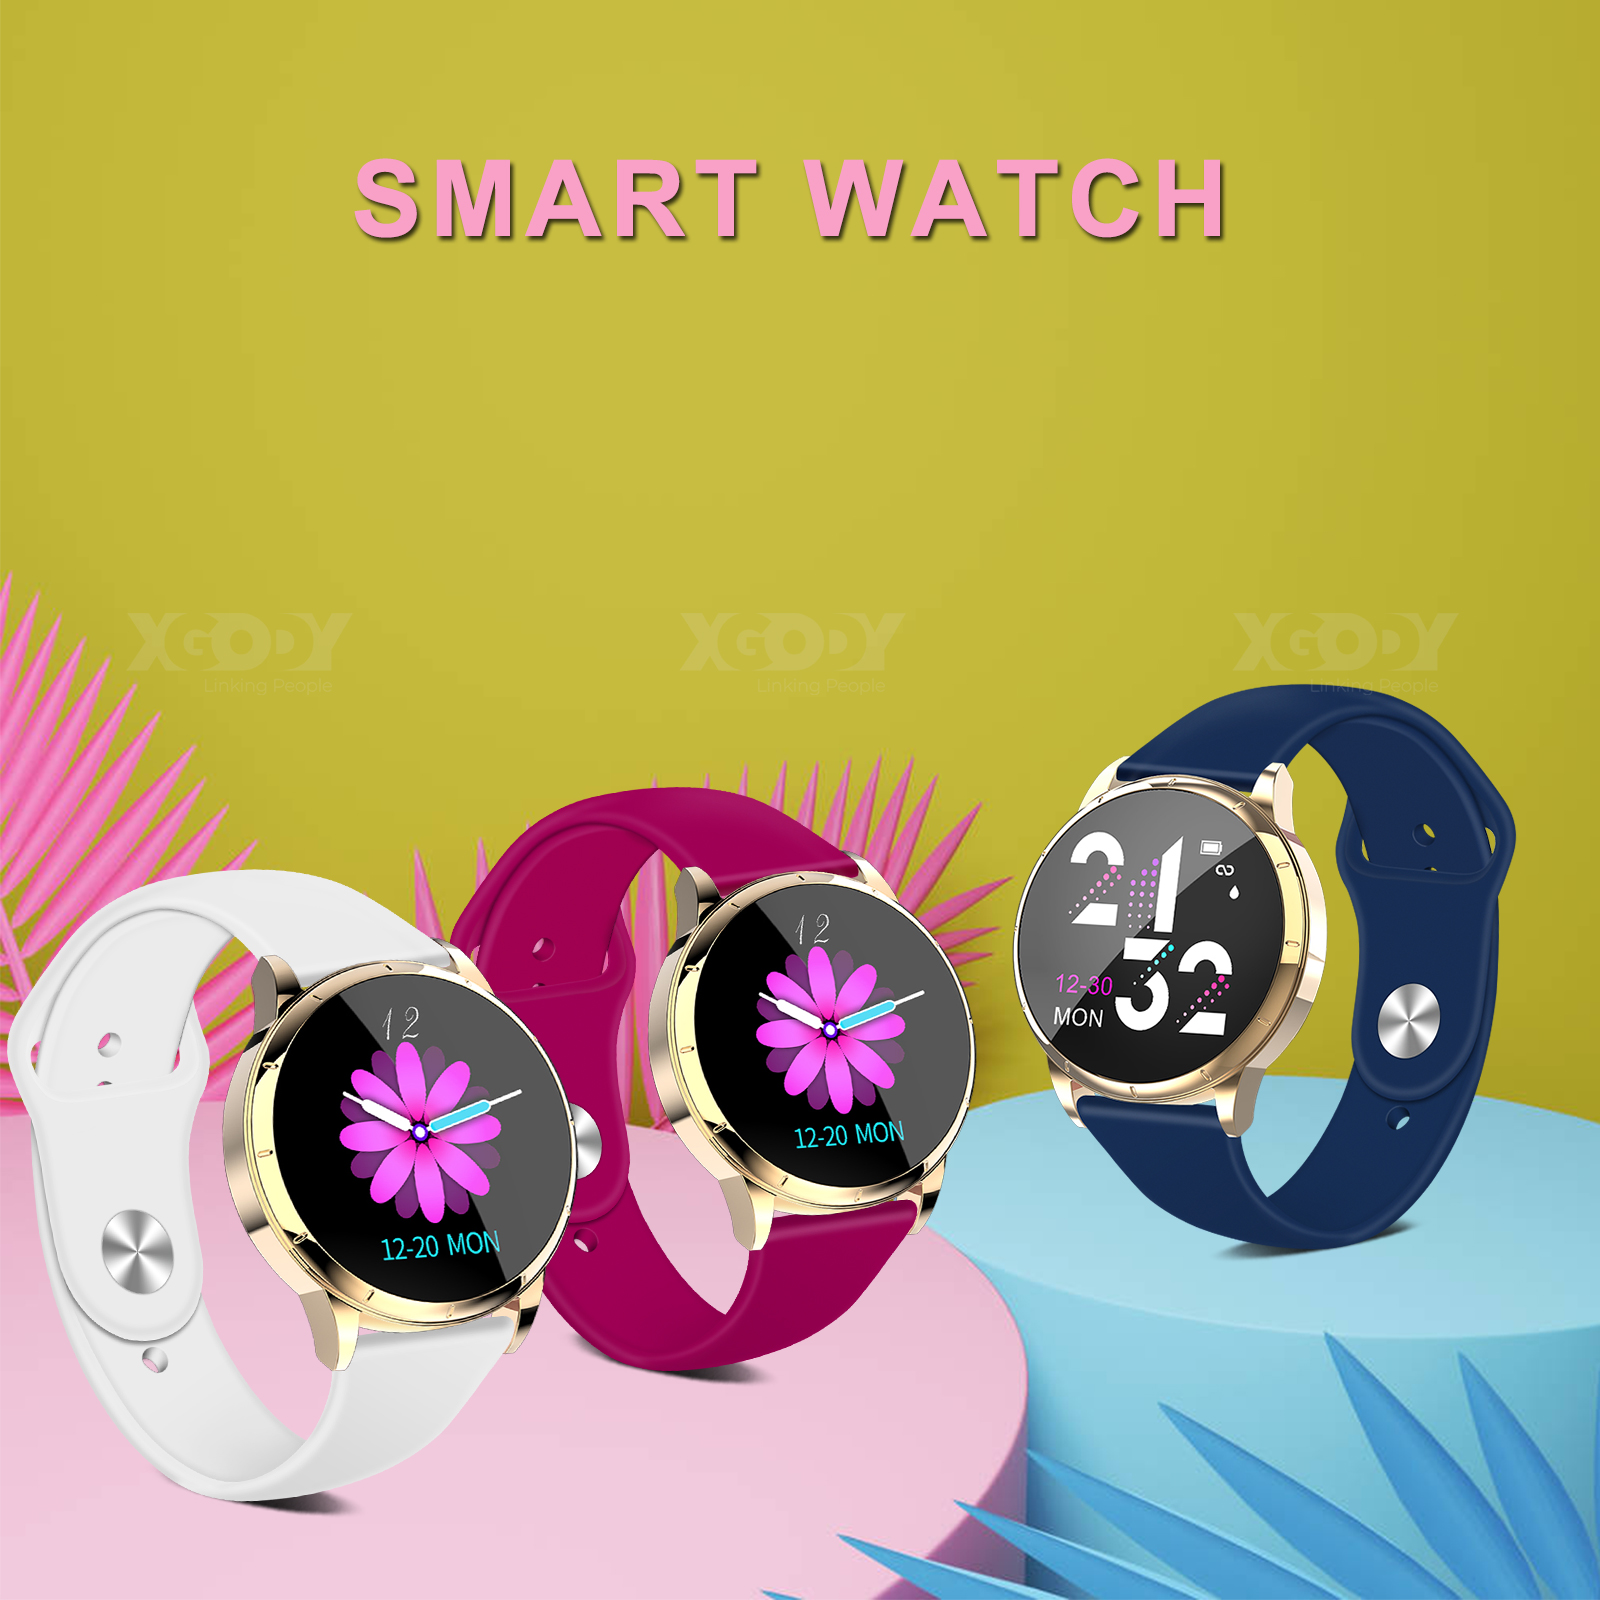 XGODY Watrerproof Smart Watch Sleep Monitor PPG Fitness Trac